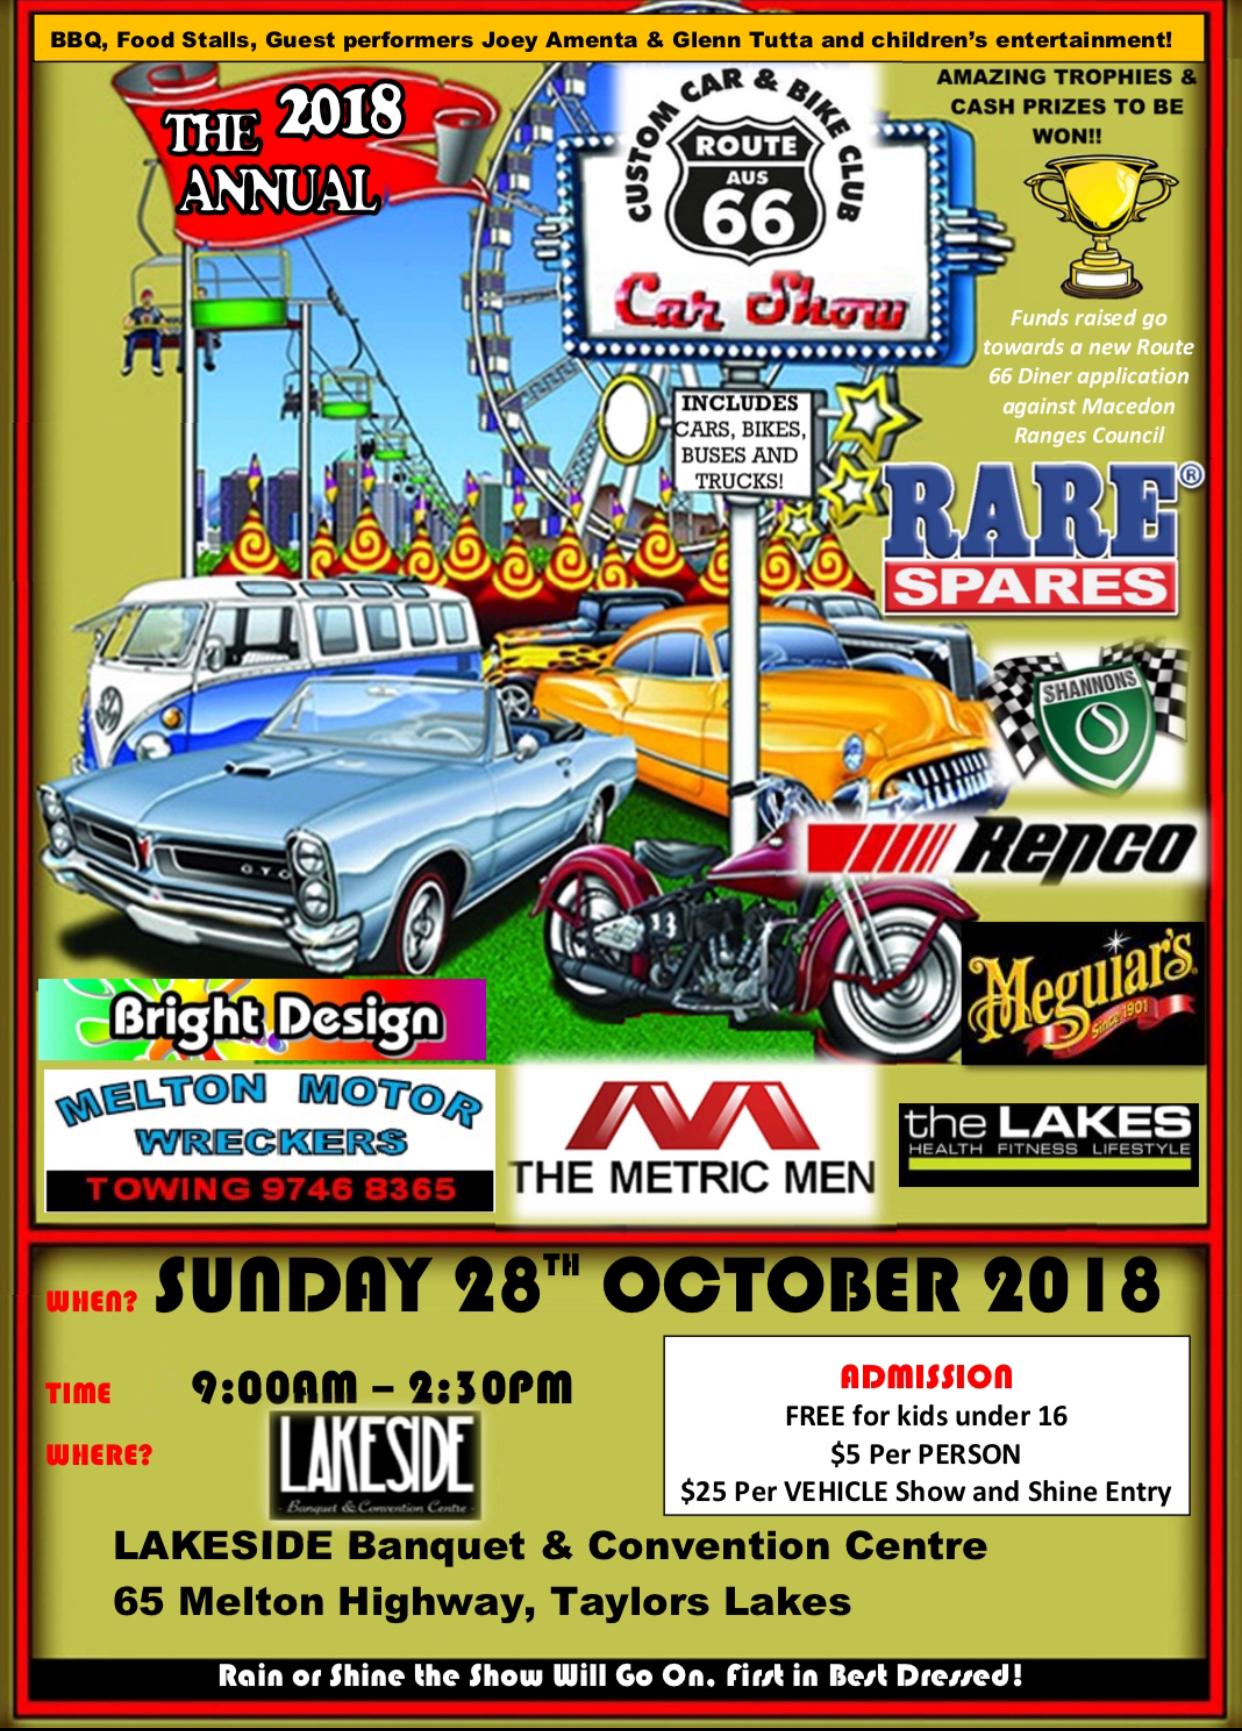 The 2018 Annual Route 66 Car Show